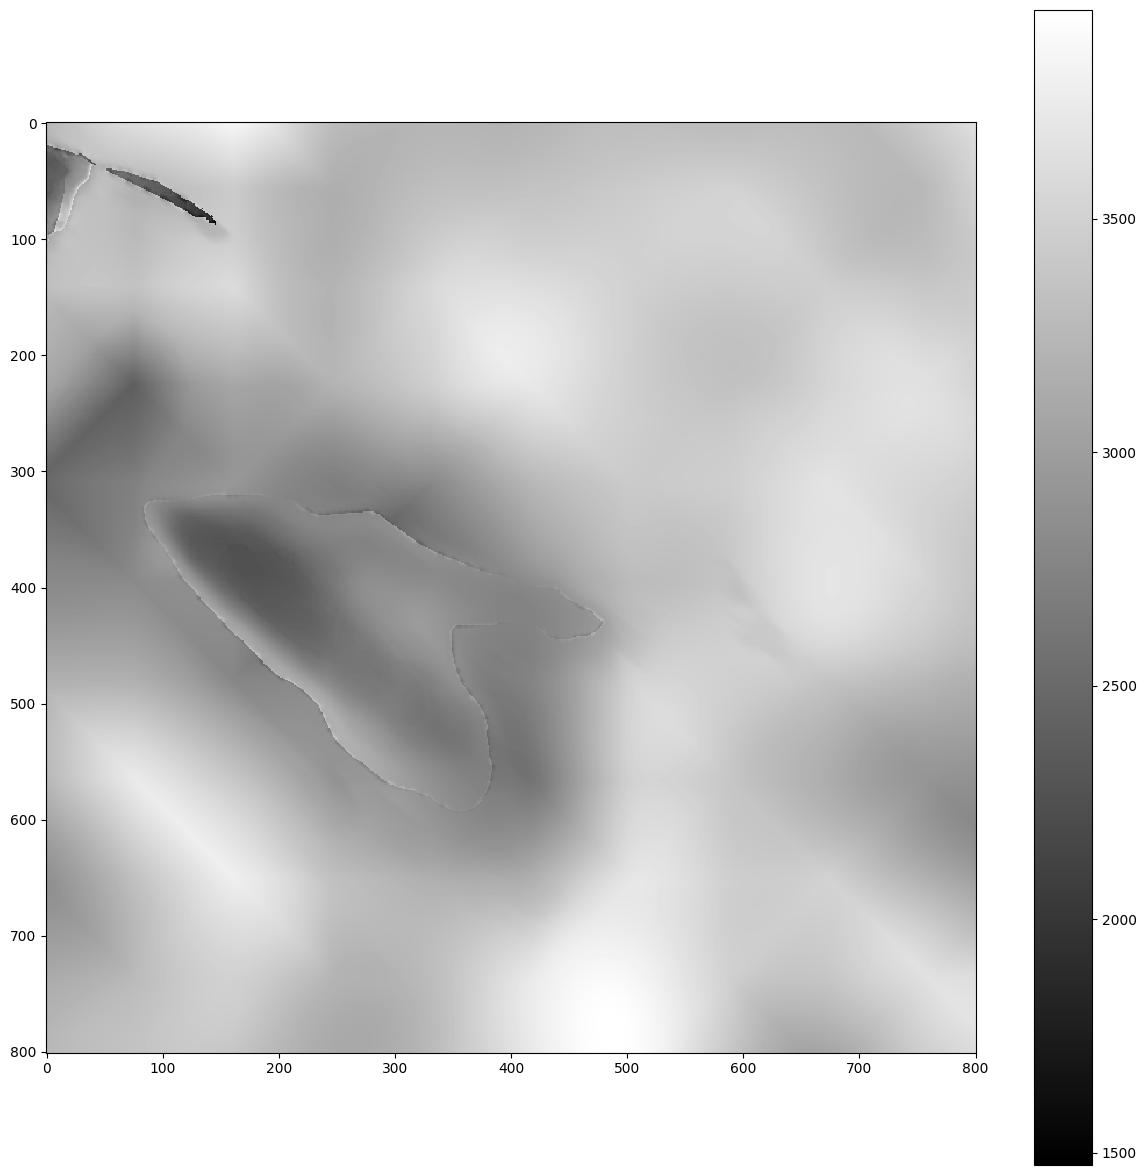 bench/seismic/wp/la_habra/meshes/velocity_model/plots/vs_5000.png